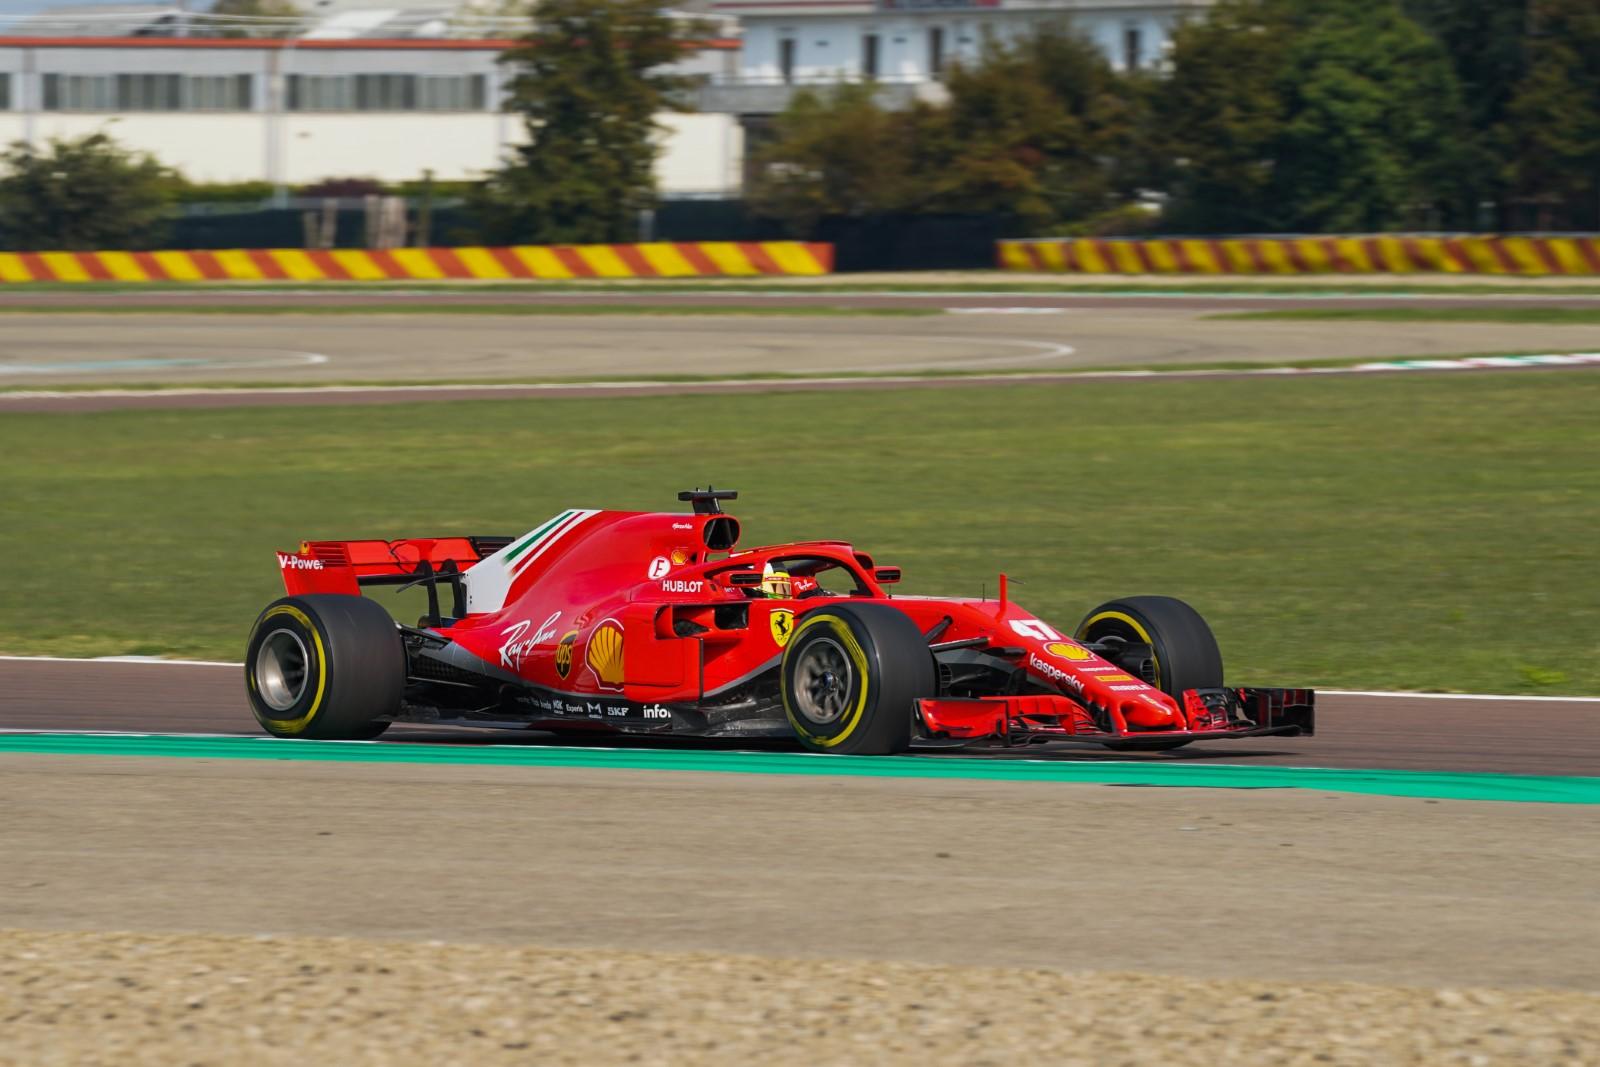 Mick Schumacher to make F1 practice debut at Eifel Grand Prix